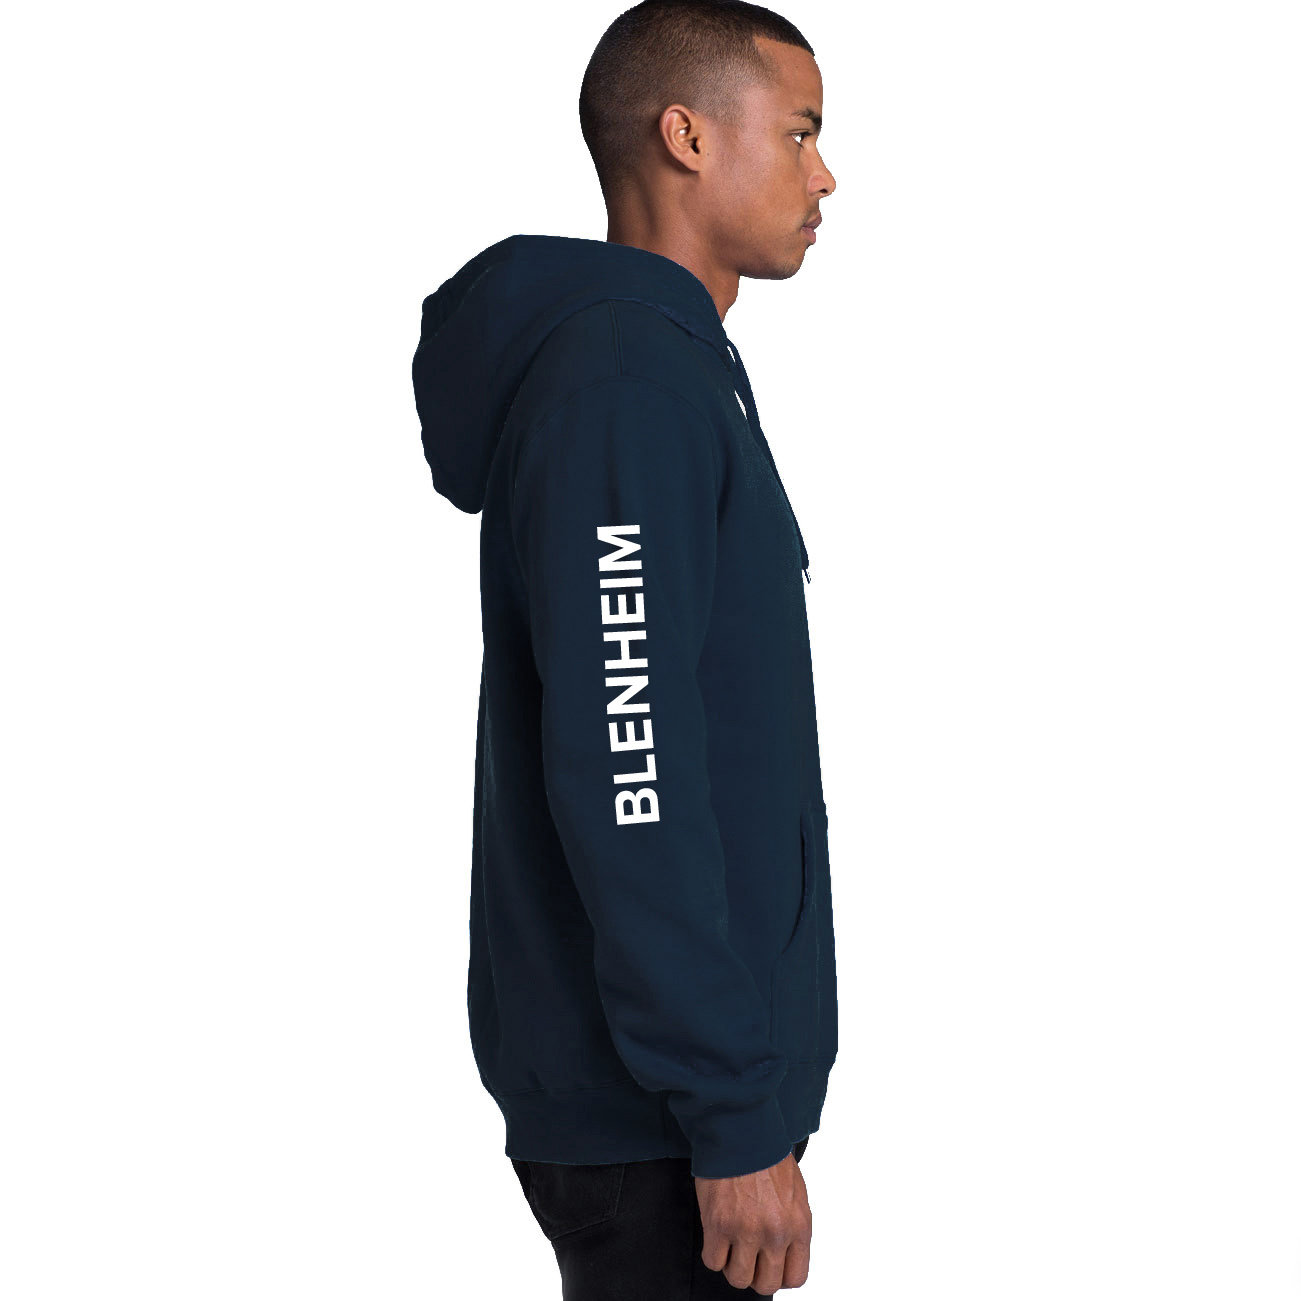 Blenheim-Swimming-Club-hoodie-adults-right-sleeve.jpg